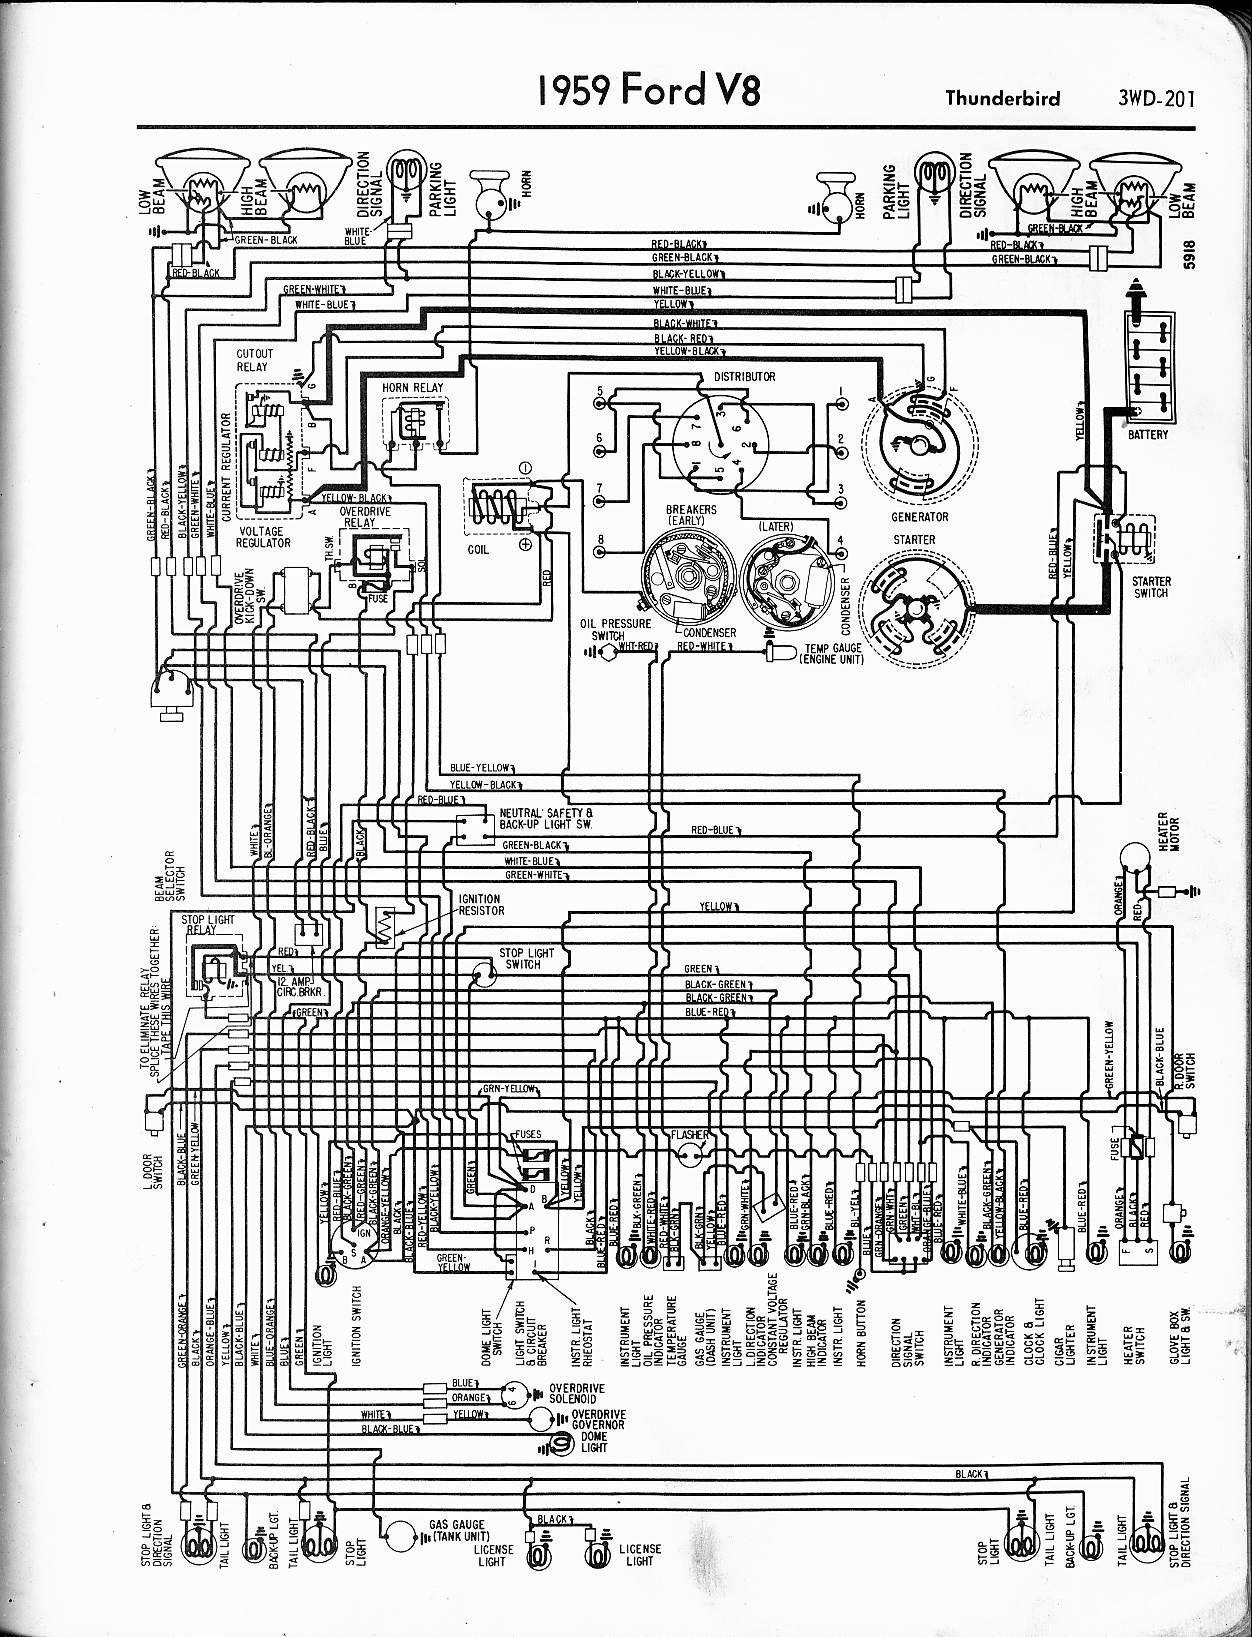 1956 corvette wiring diagram 1956 thunderbird wiring diagram pdf wiring diagram  1956 thunderbird wiring diagram pdf